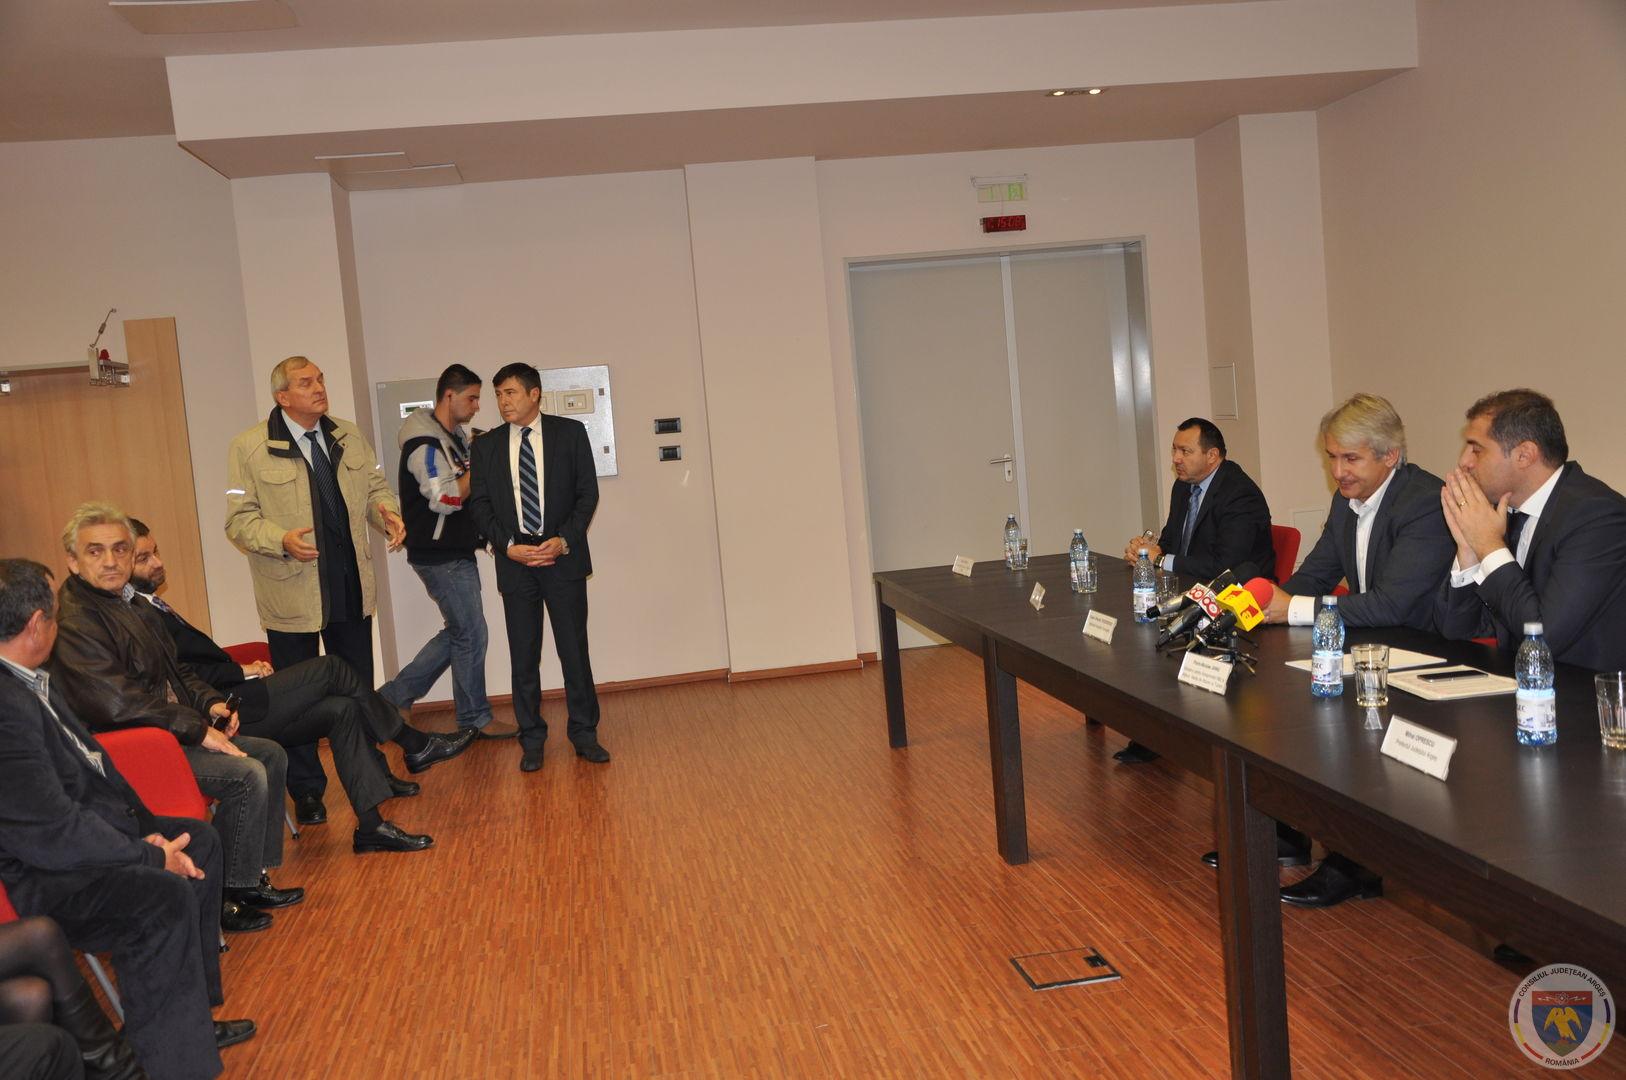 Conferinta Ministrii Teodorovici & Jianu 11.11.2014 (9).JPG